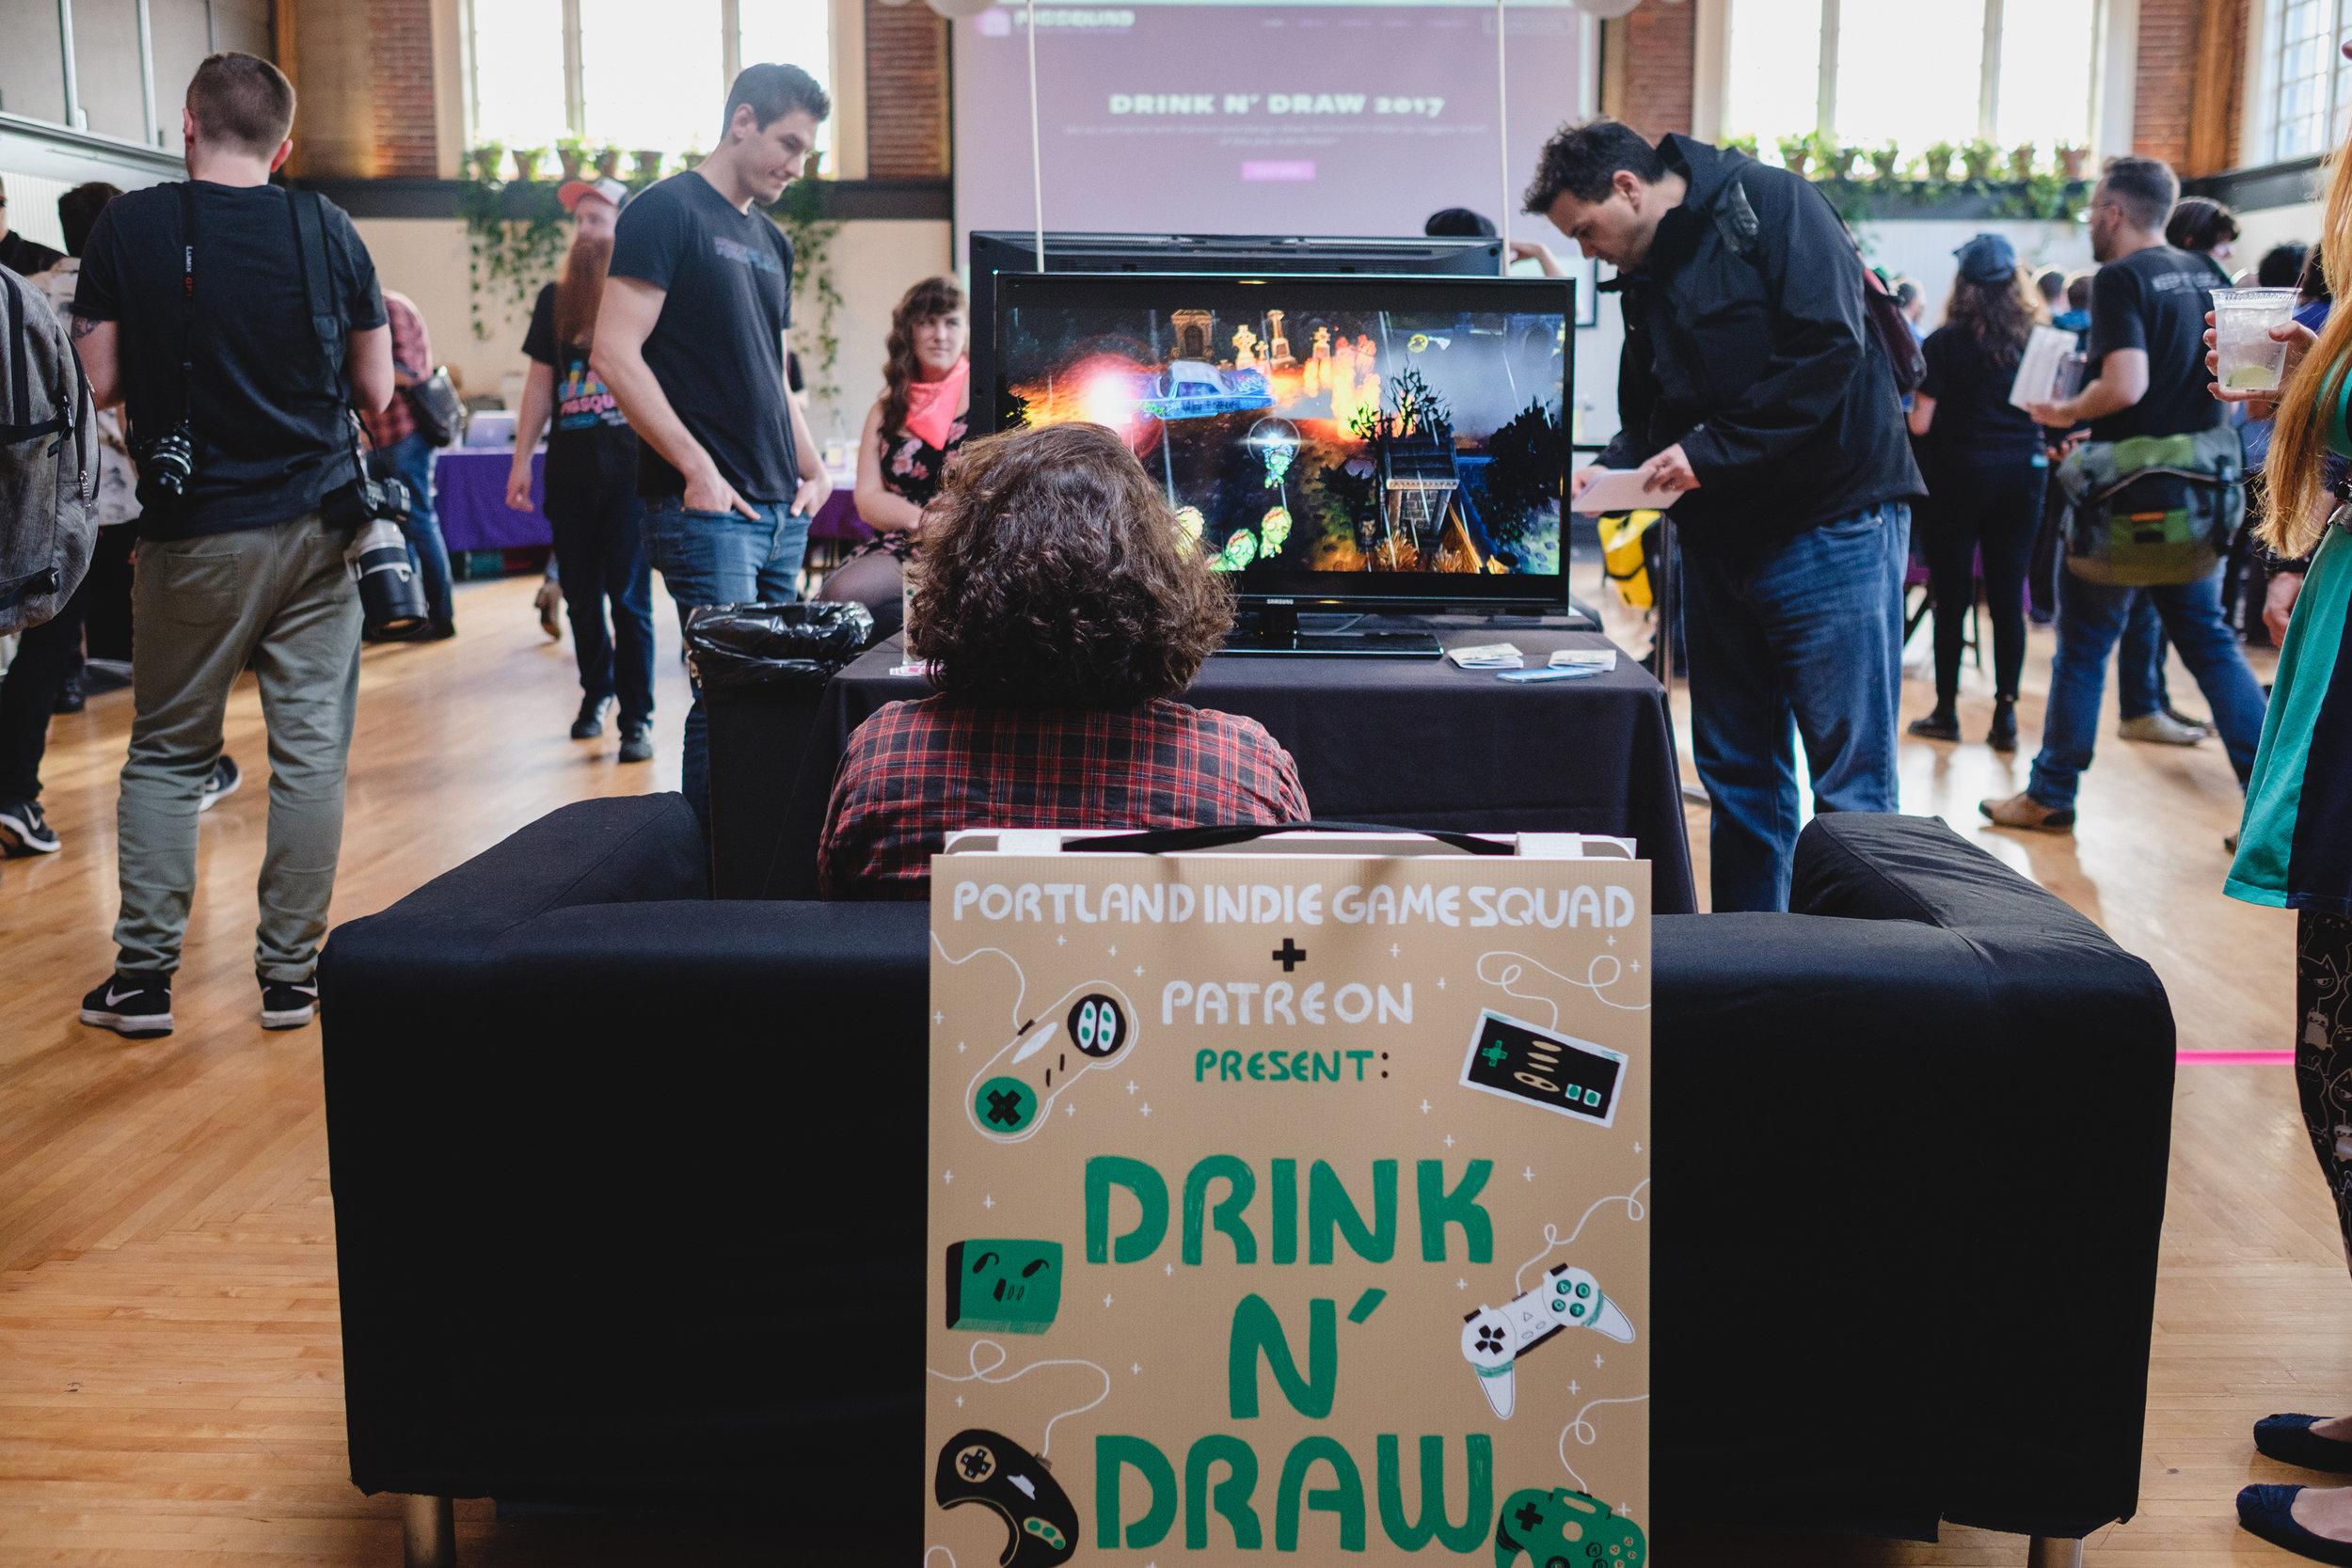 drink-n-draw--portland-indie-game-squad--patreon--design-week-portland_34183373272_o.jpg